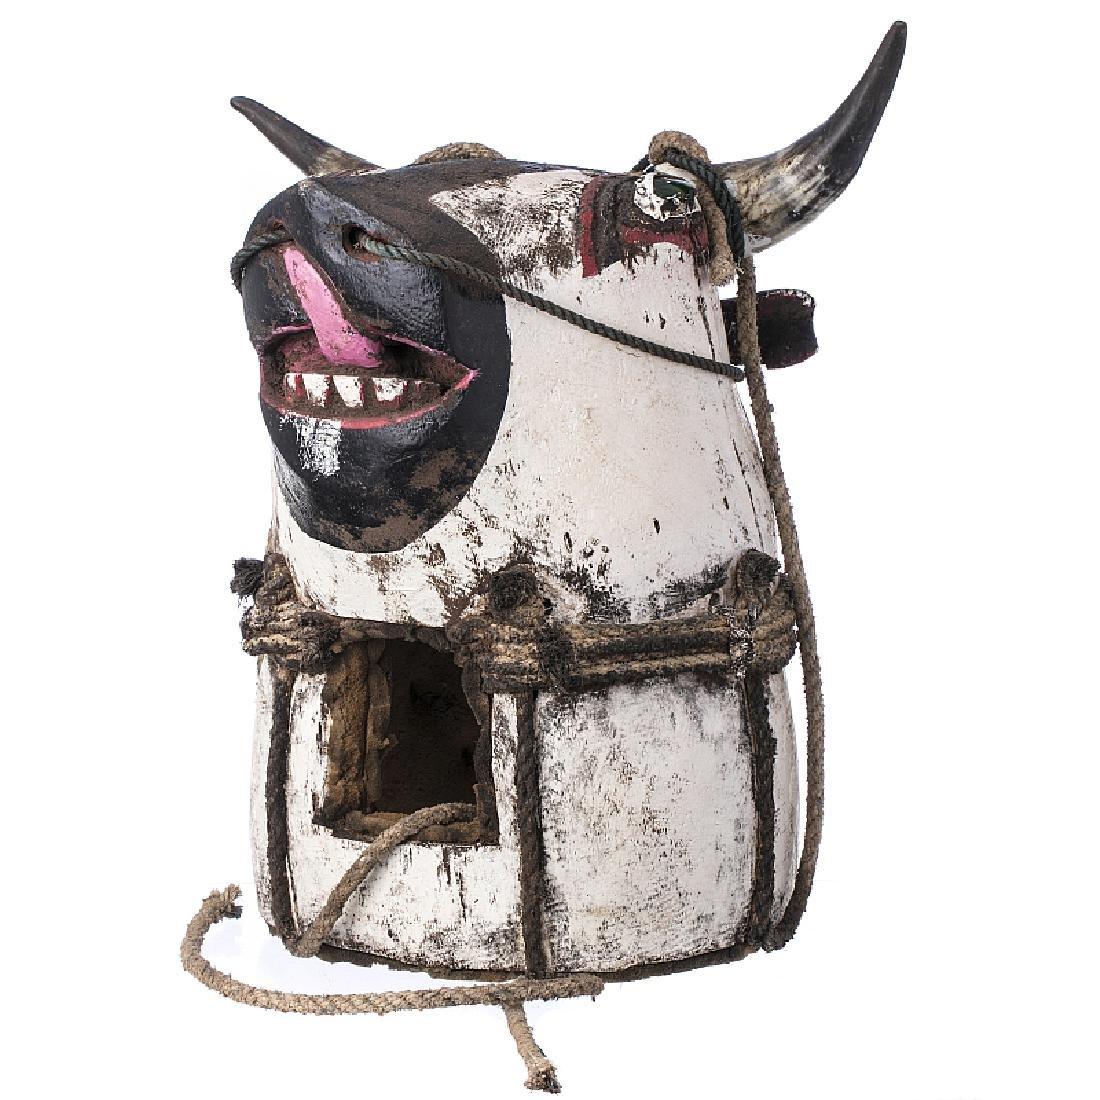 BIDJOGO - Vaca Brutu head mask